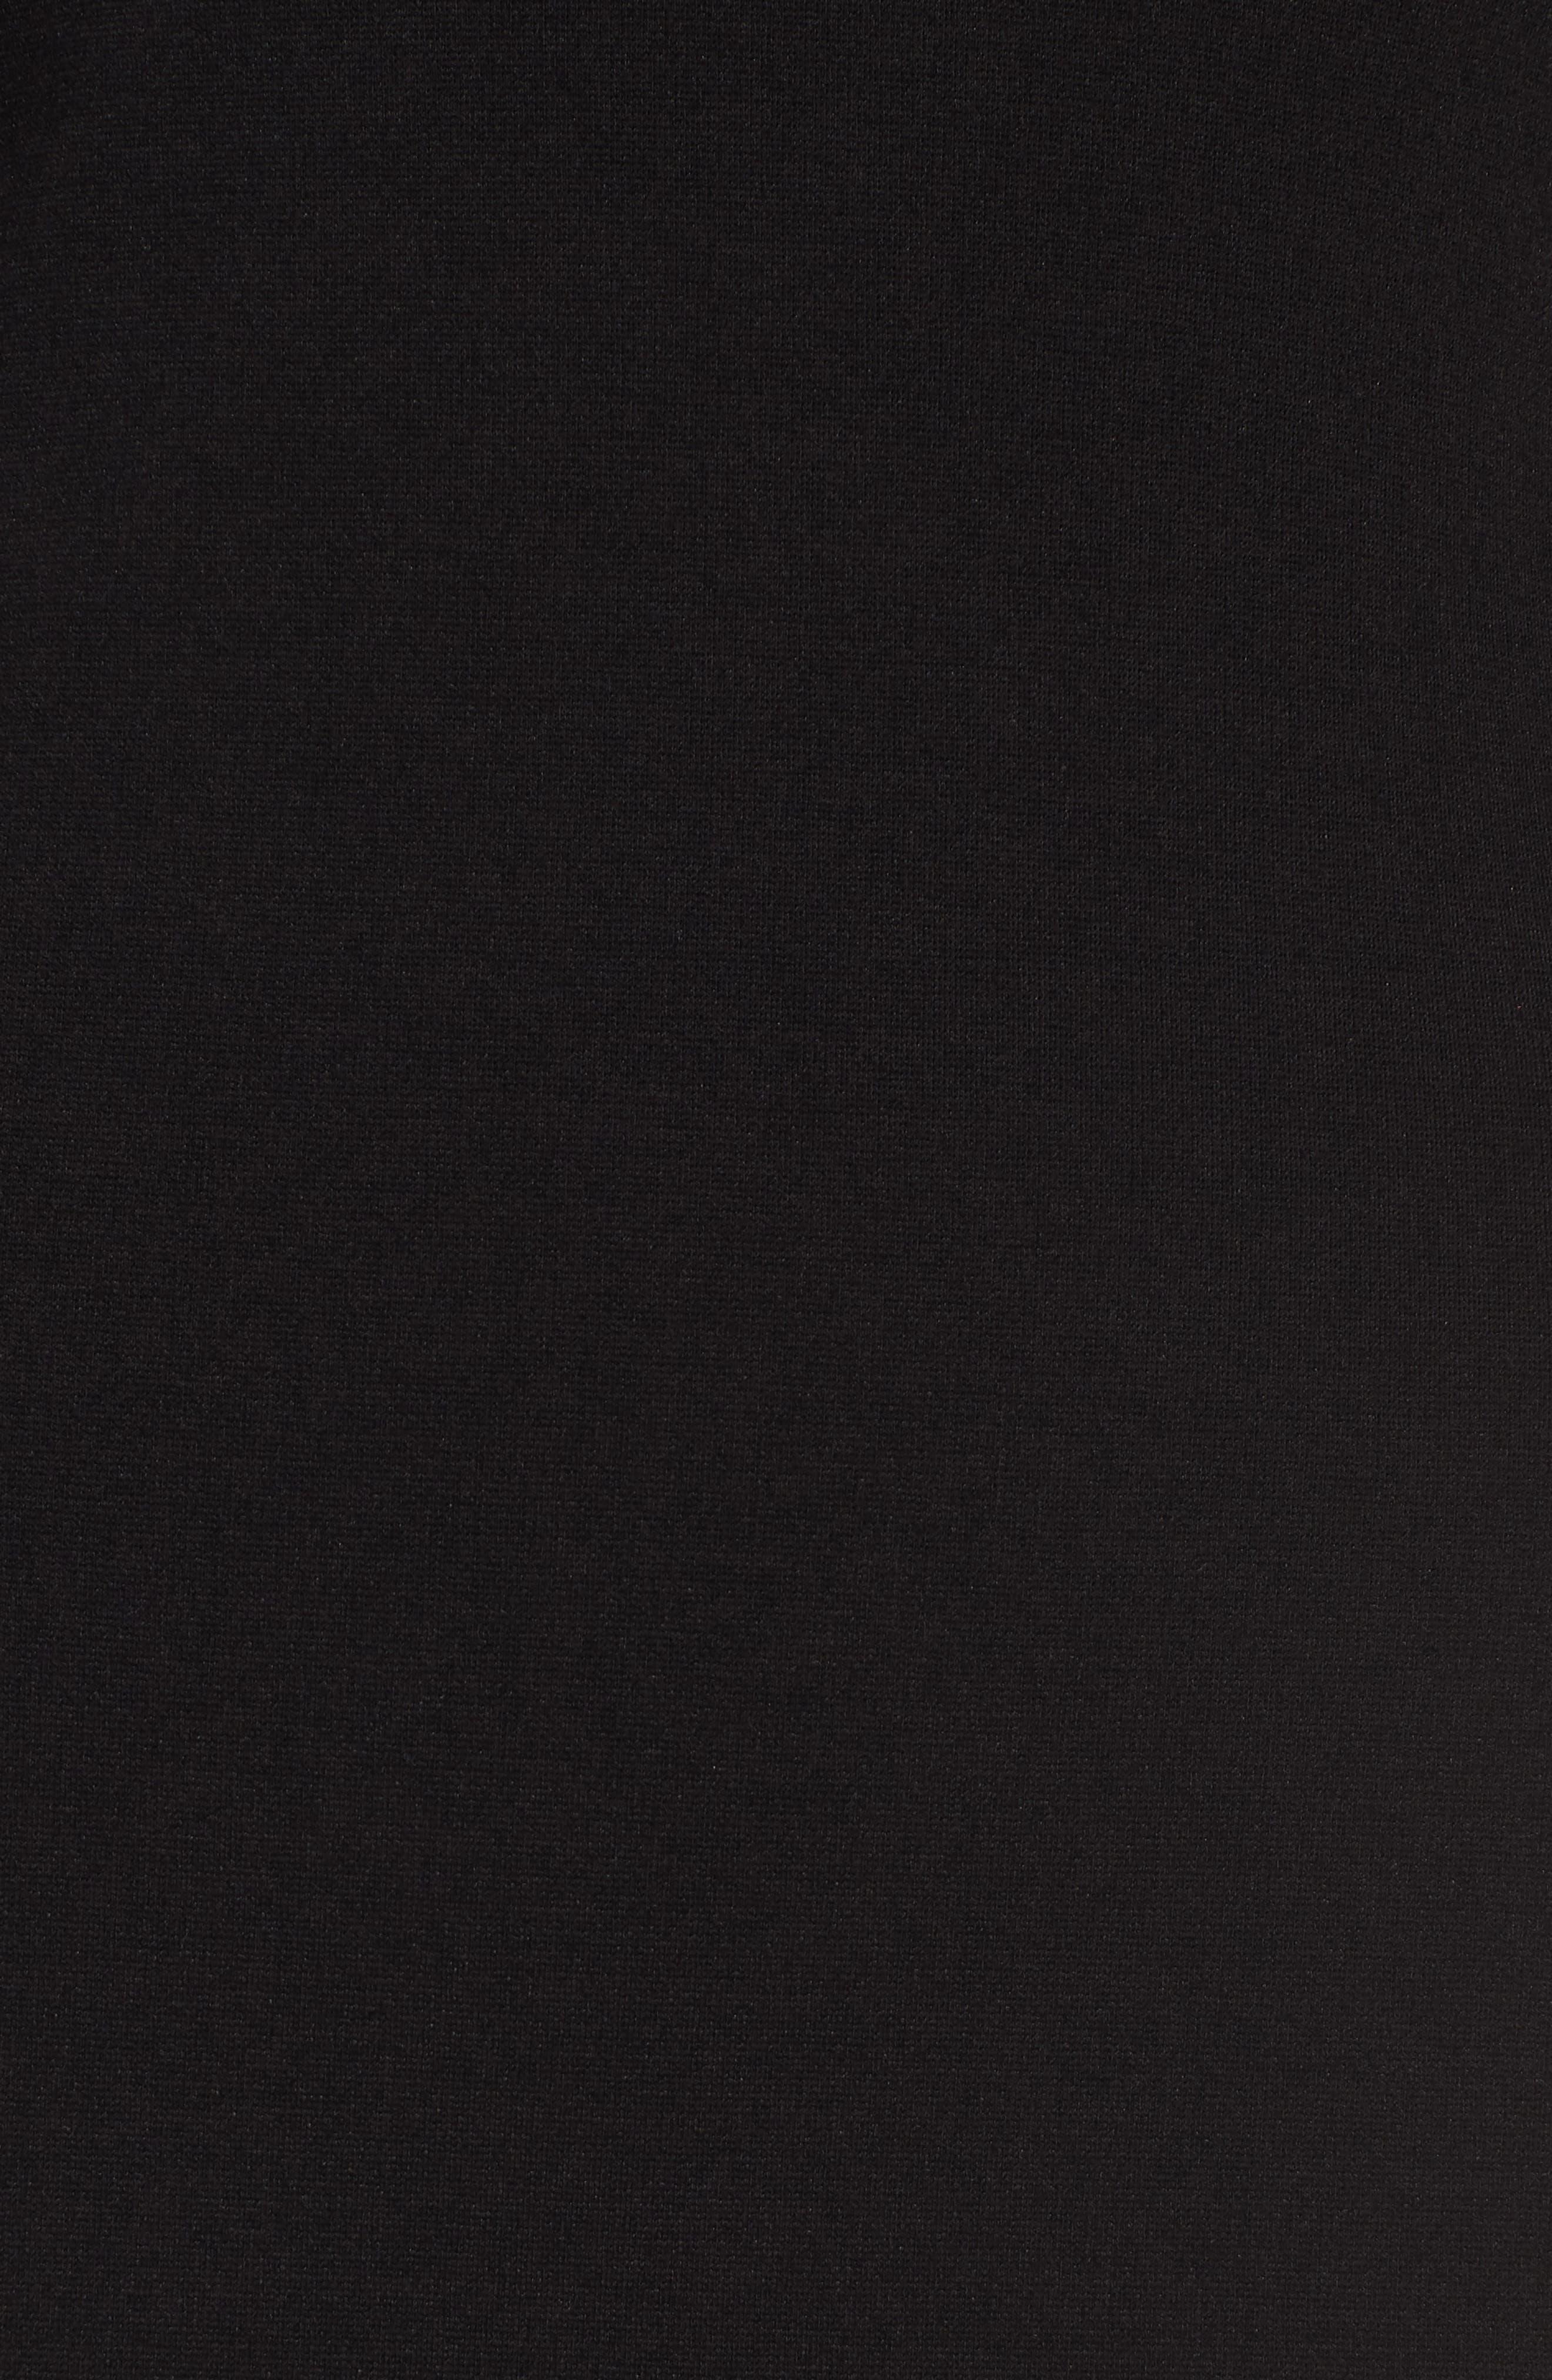 V-Front Bodycon Dress,                             Alternate thumbnail 6, color,                             Black